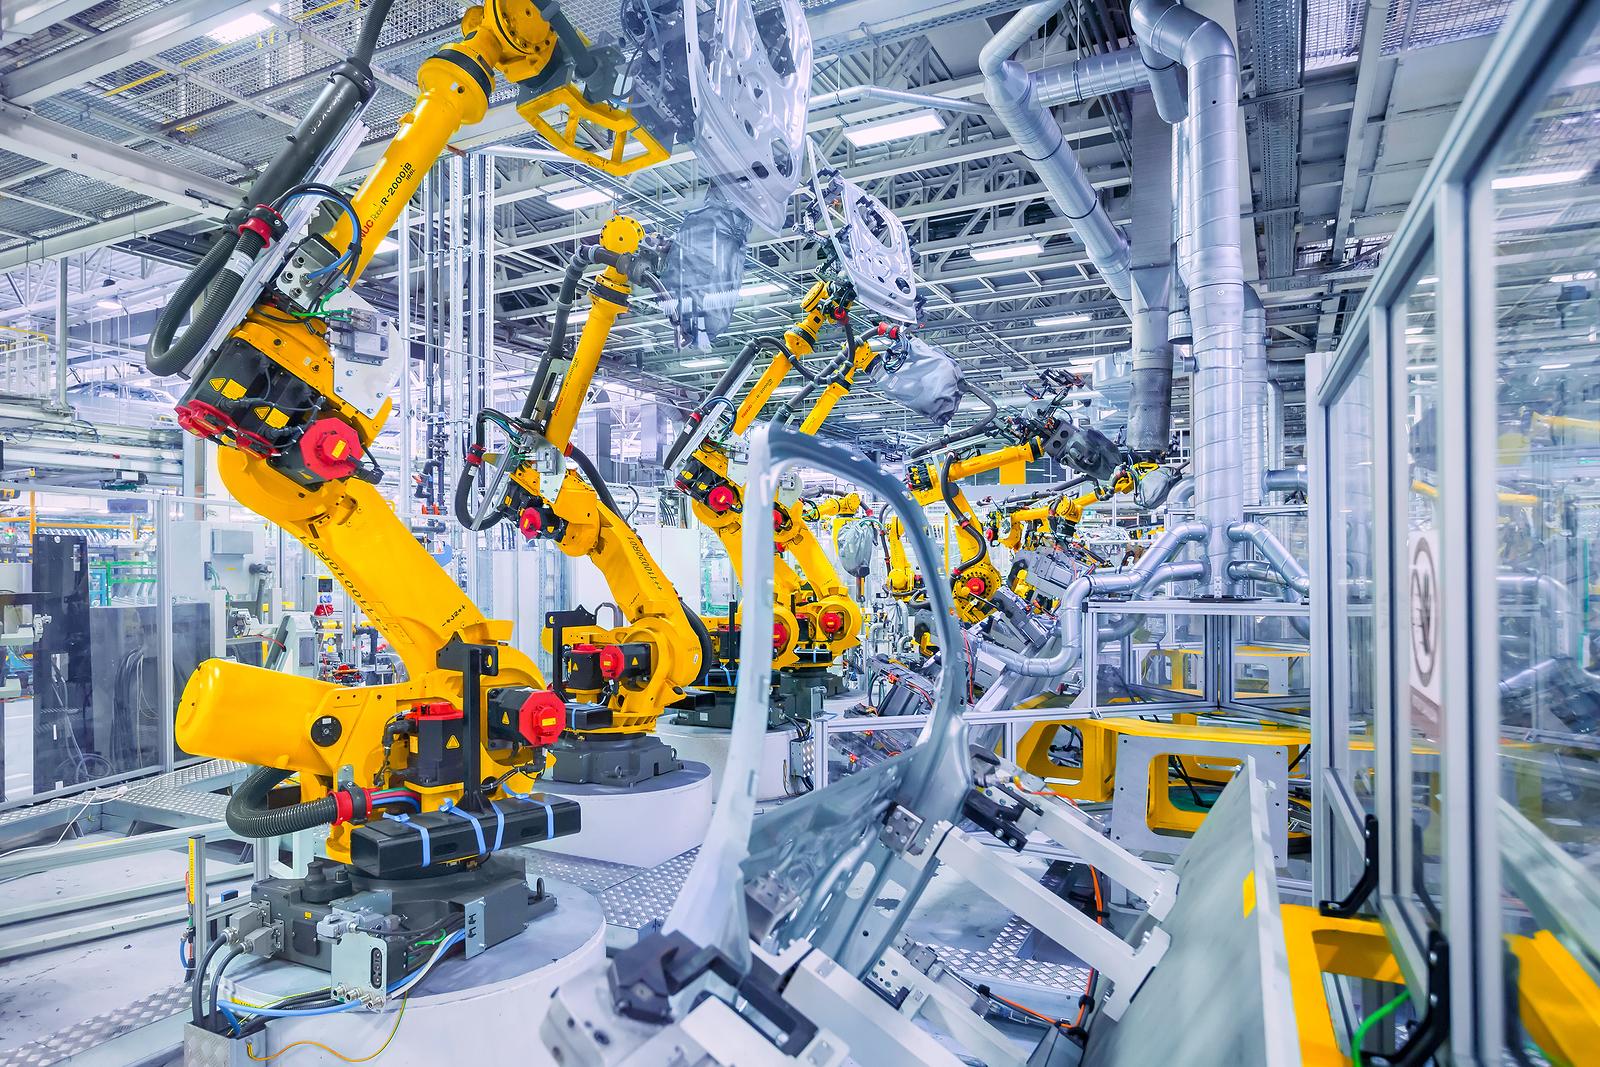 kereskedelmi robotok fajtái)